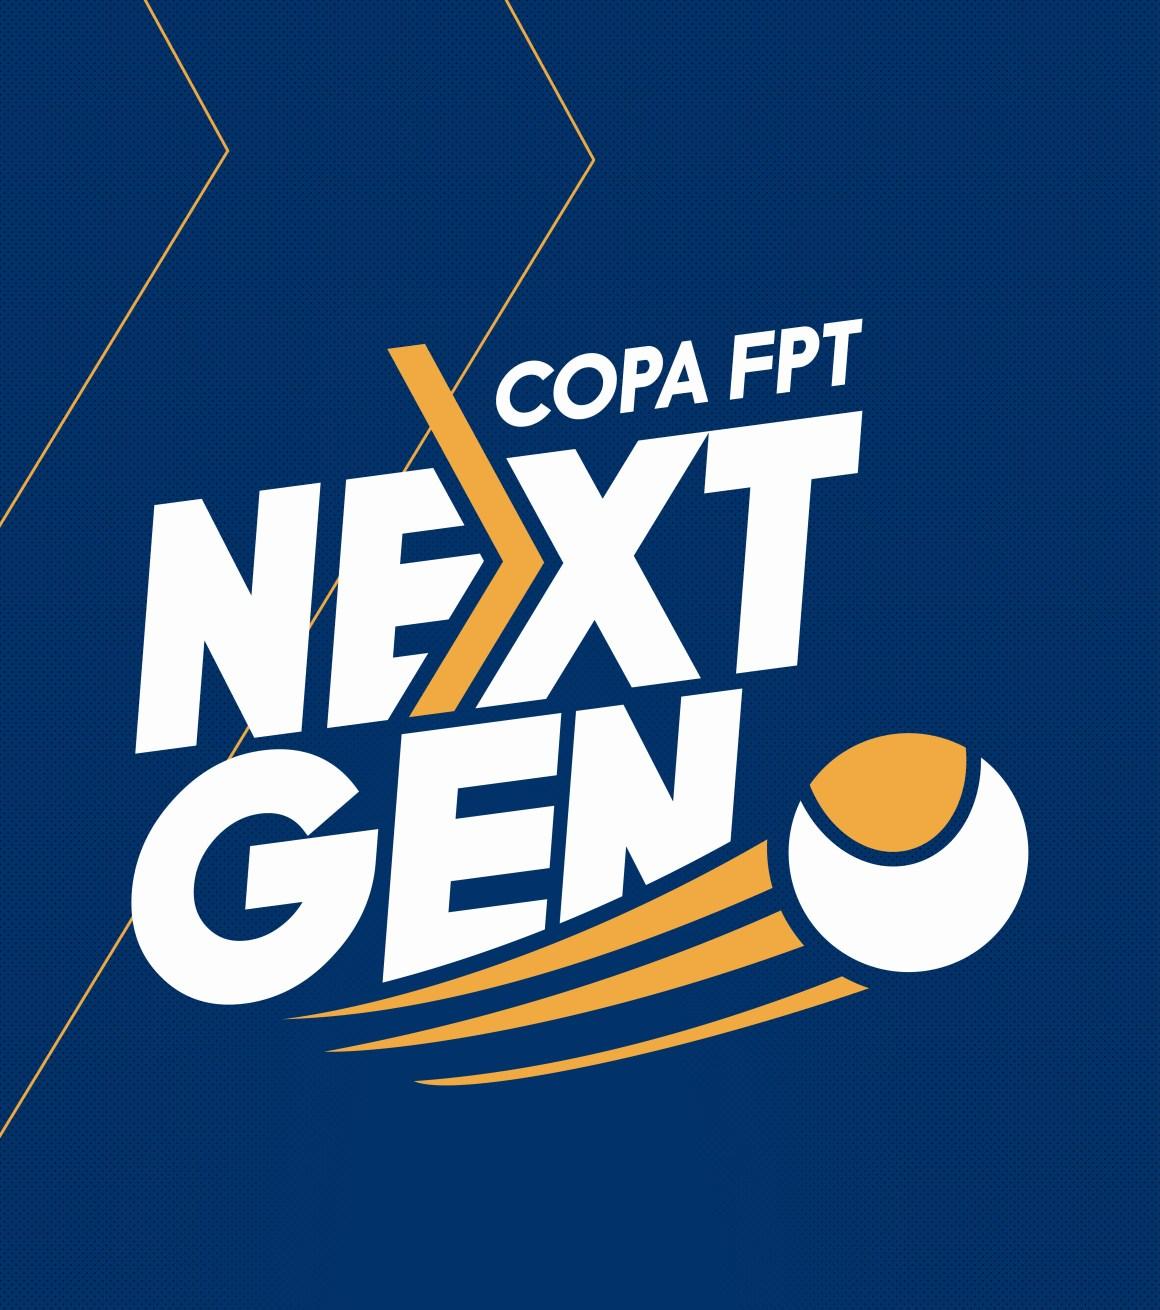 3ª COPA FPT NEXT GEN   CHAVE E PROGRAMAÇÃO